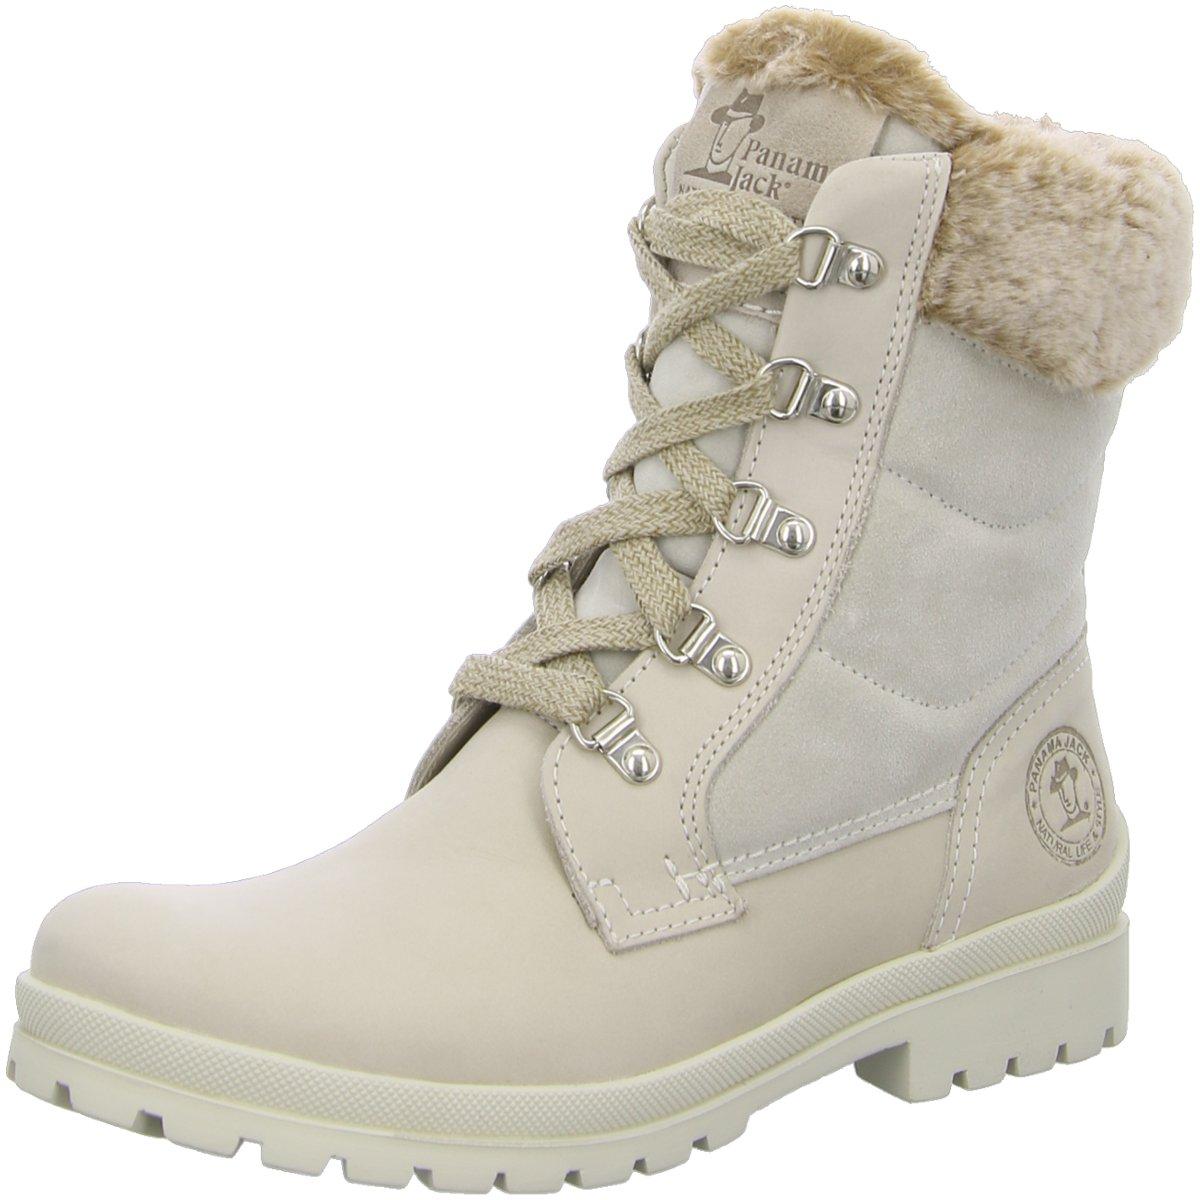 NEU Panama Jack Damen Stiefel TUSCANI B11 beige 333426